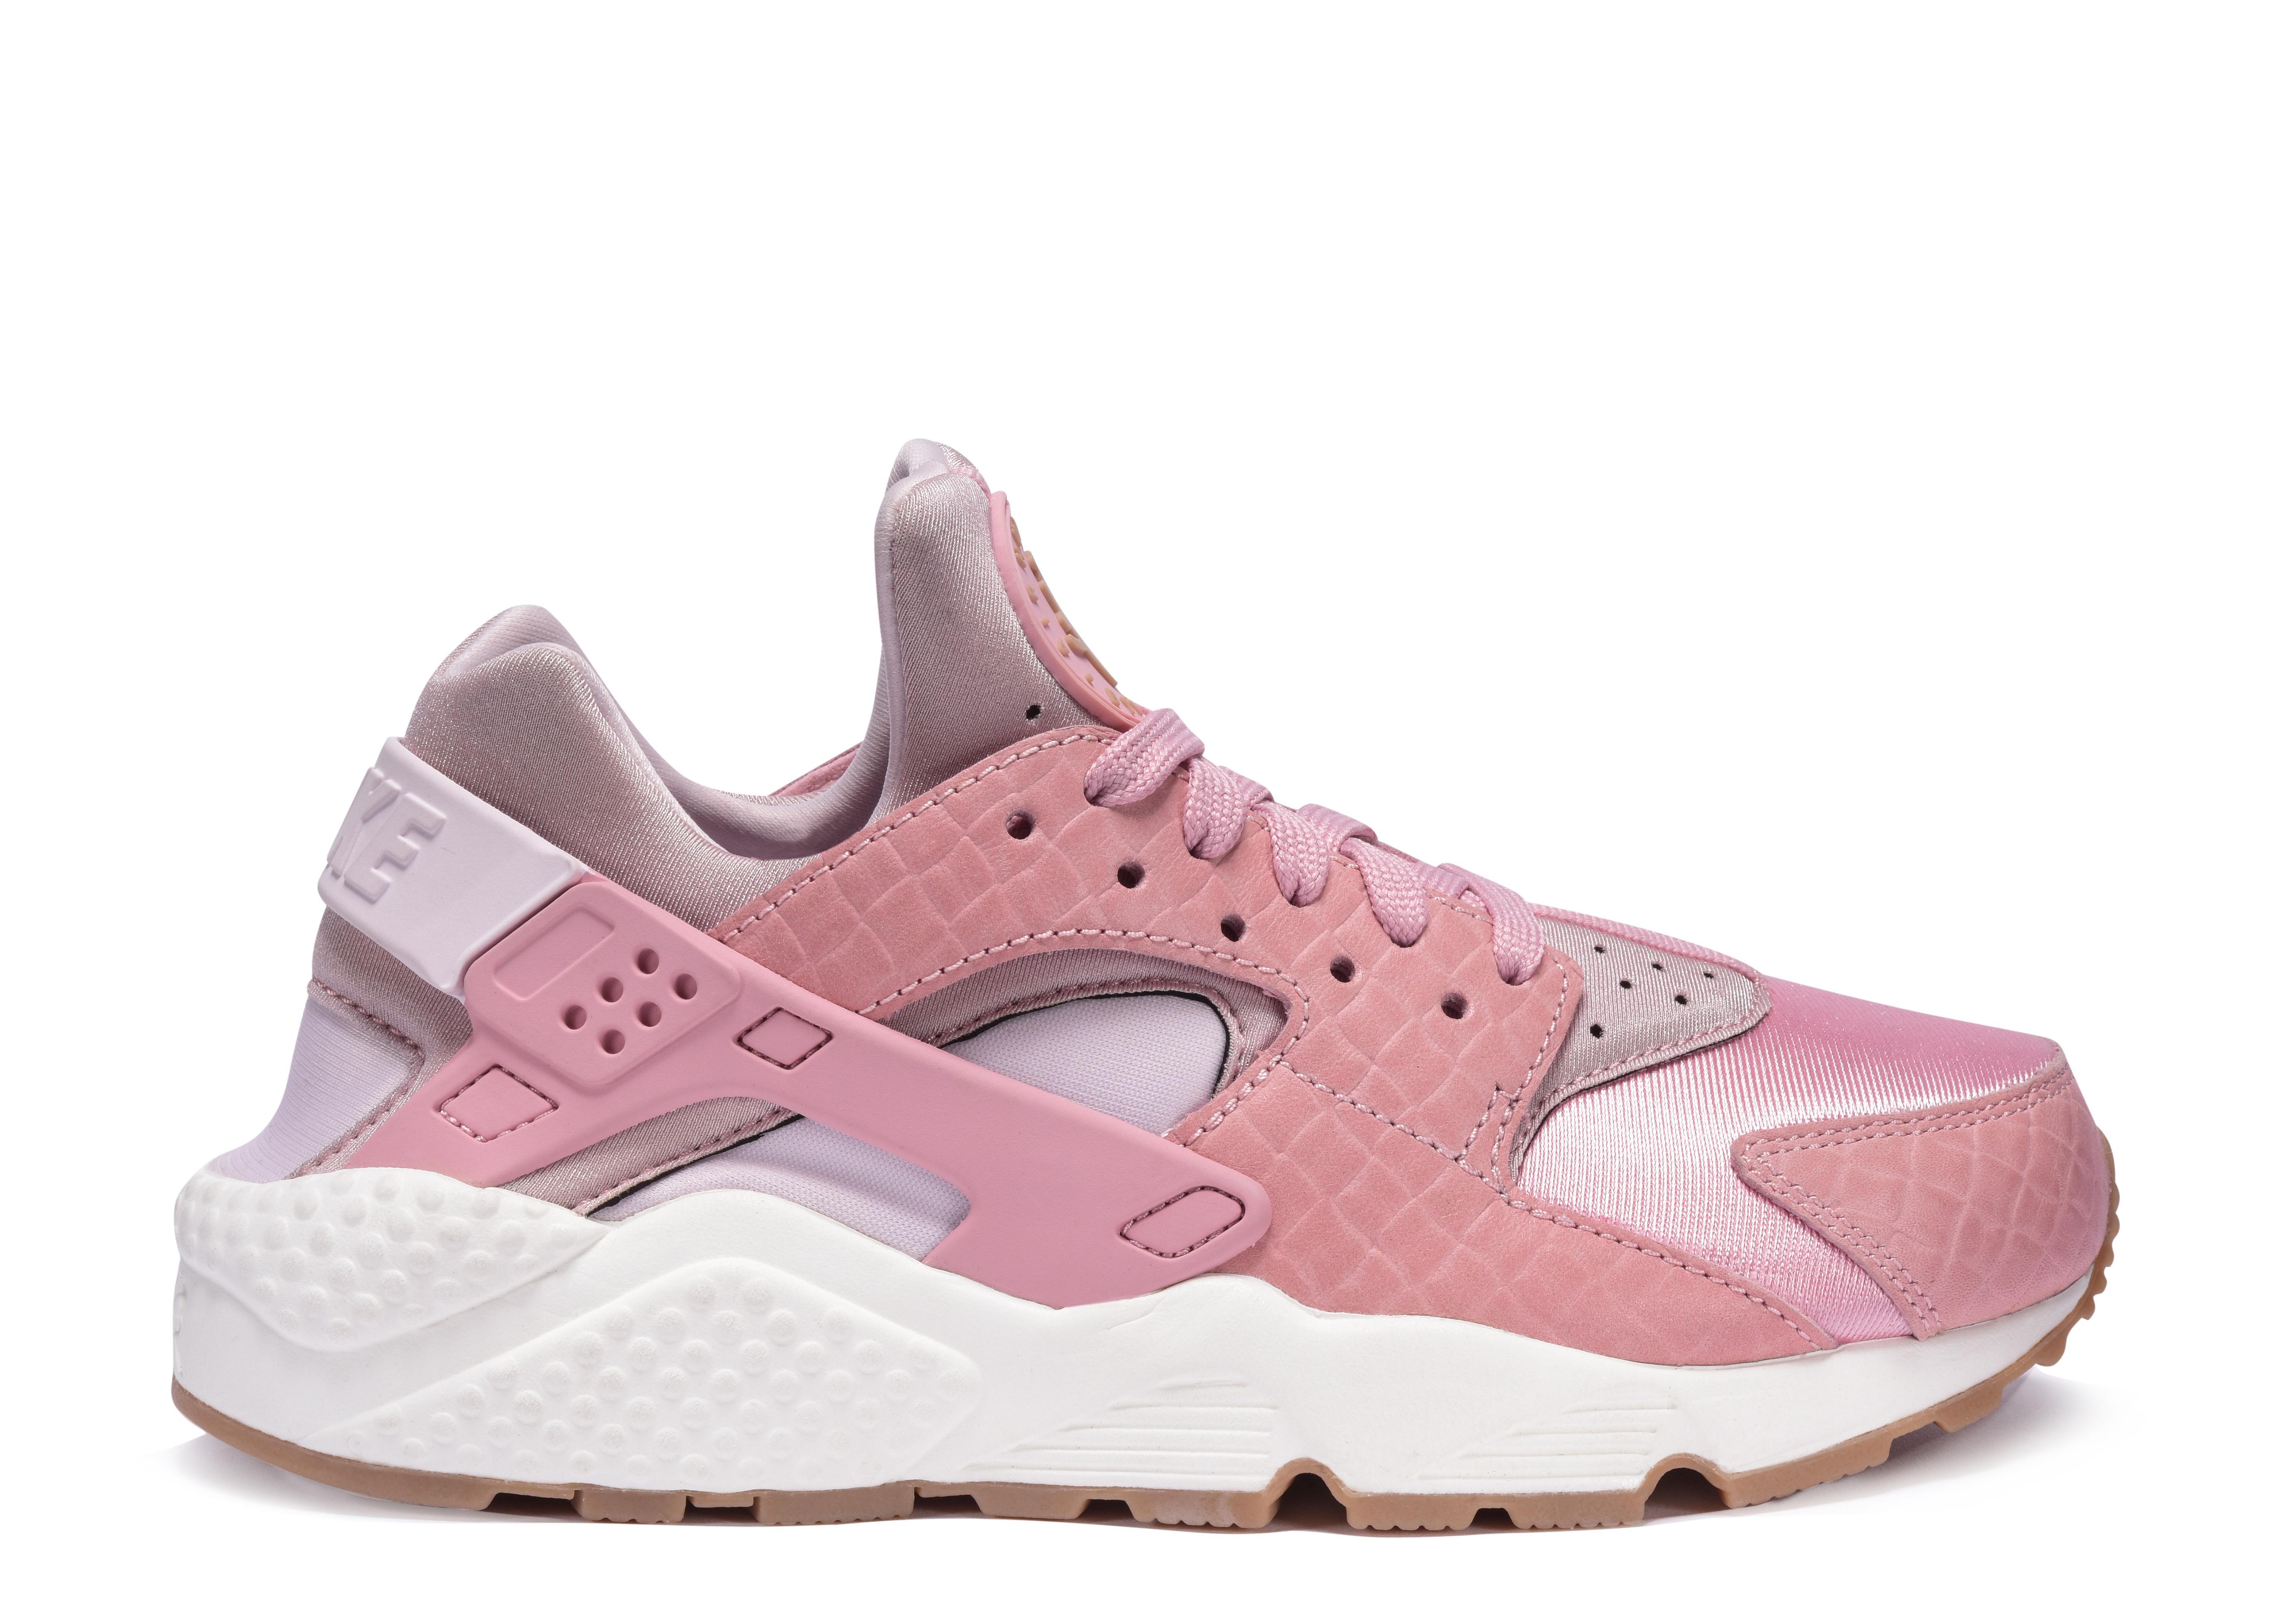 Nike Huarache Run PRM Pink GLZ PRL PN